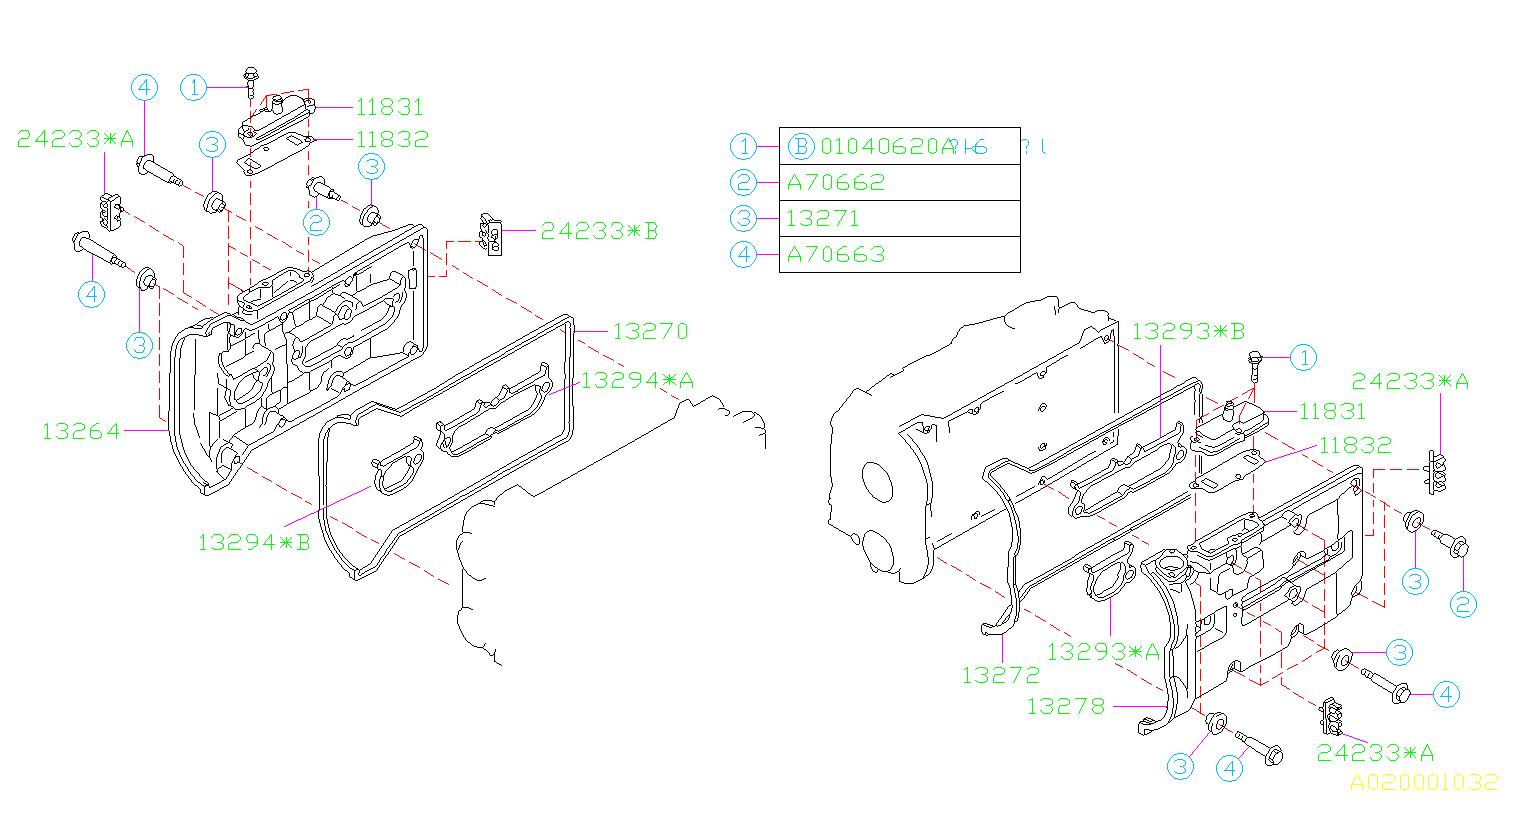 Subaru Svx Engine Valve Cover Gasket